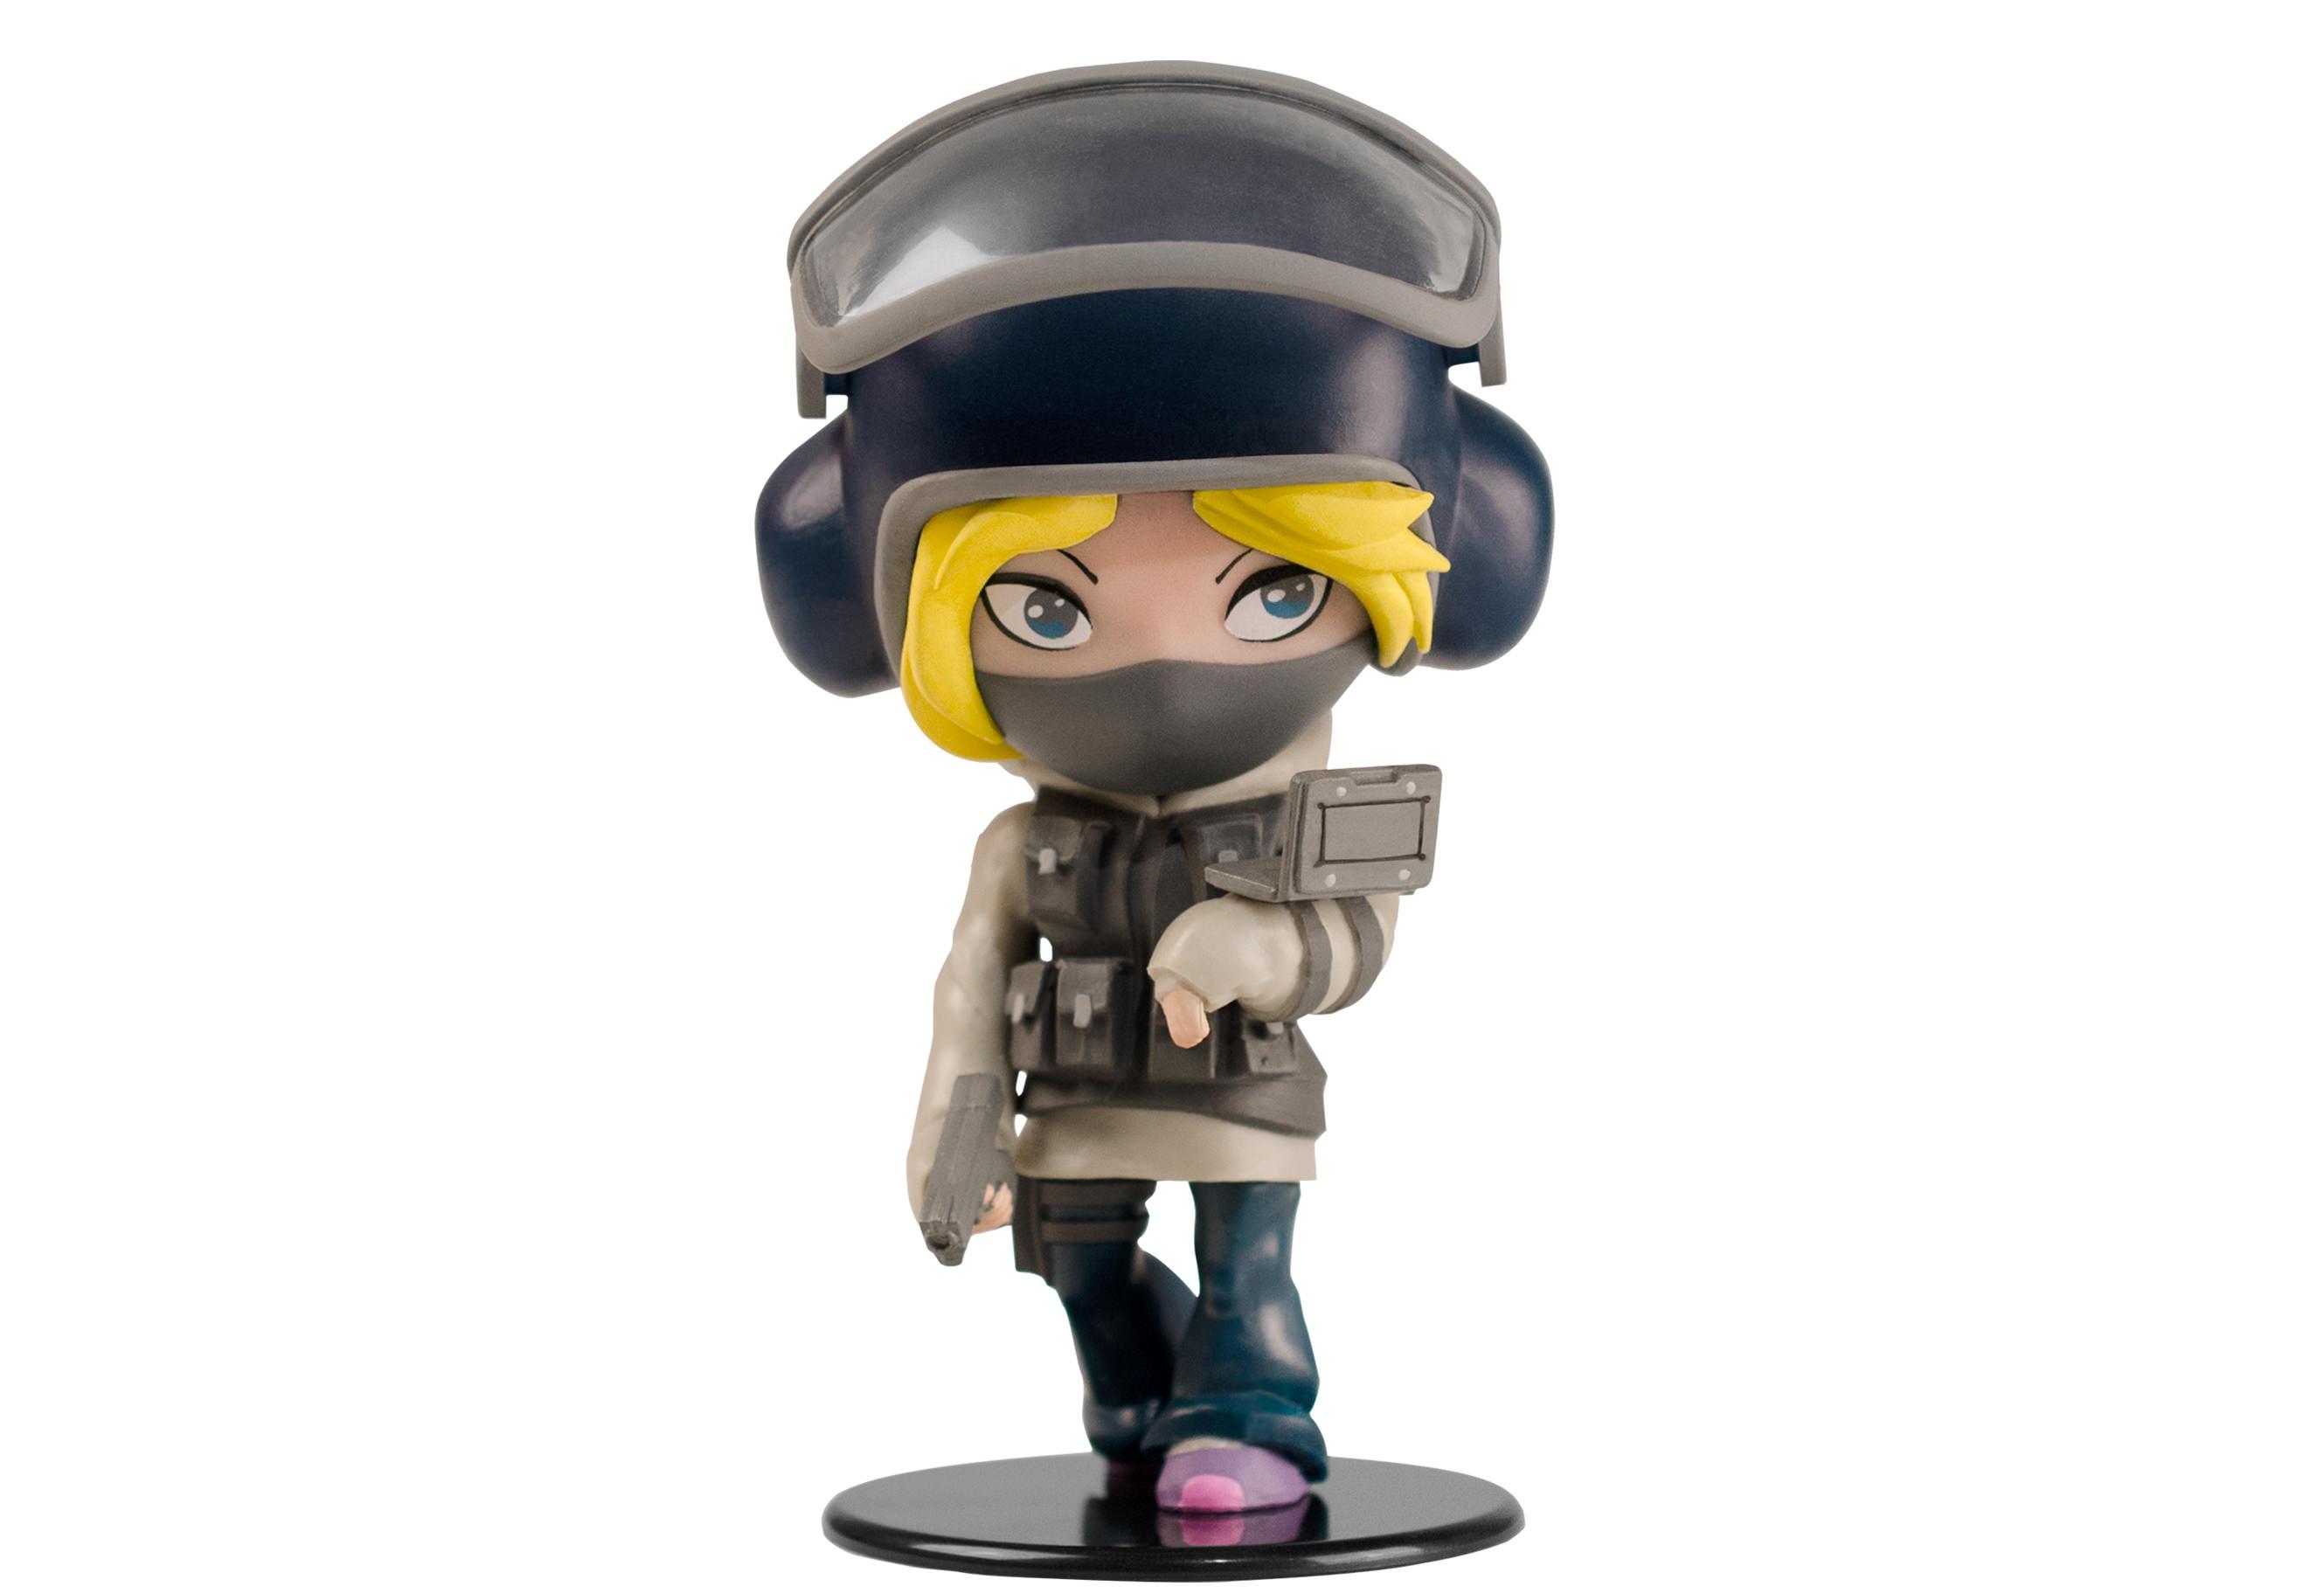 IQ Figurine Six Siege Official Ubisoft Store Ubi